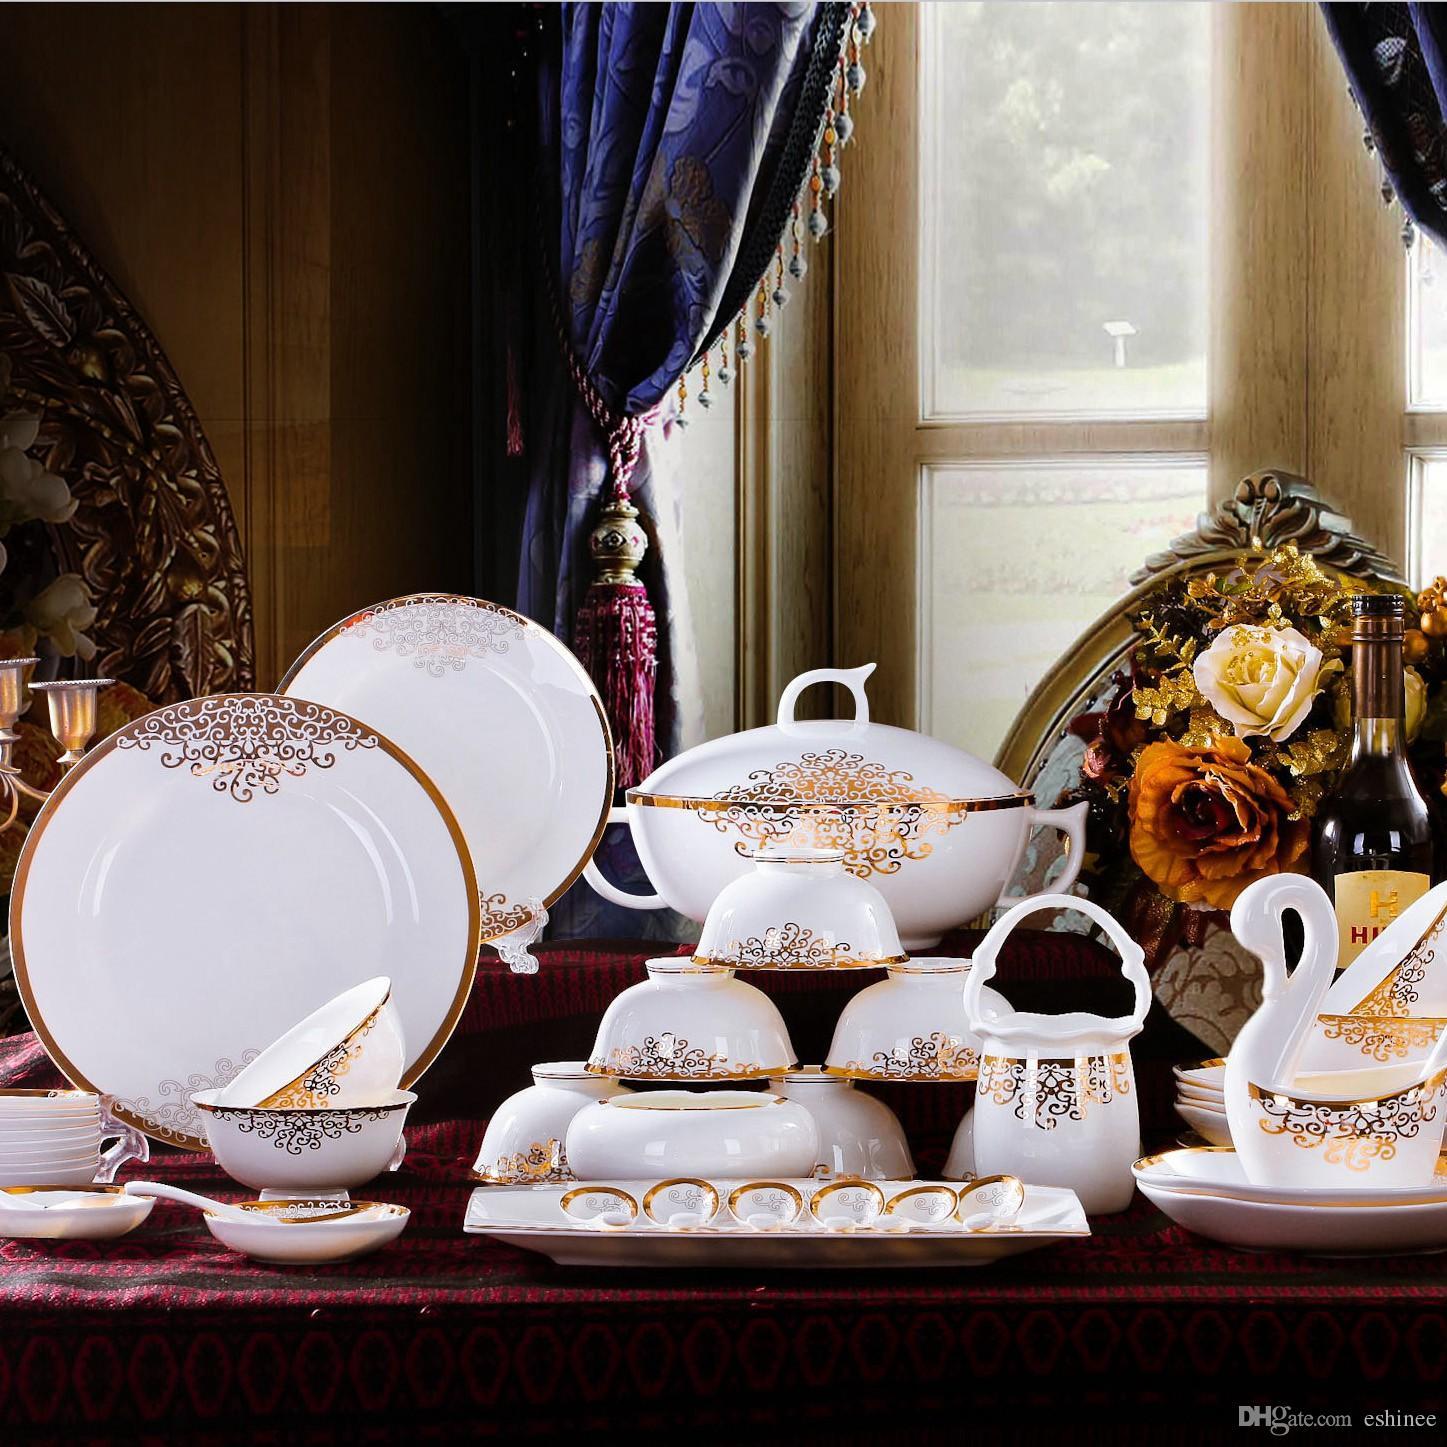 New Year Hot Sale Fine Bone China Dinnerware Sets Gifts Porcelain Aegean Sea Tuscan Dinnerware Sets Unique Dinnerware Sets From Eshinee $125.63| Dhgate.Com & New Year Hot Sale Fine Bone China Dinnerware Sets Gifts Porcelain ...